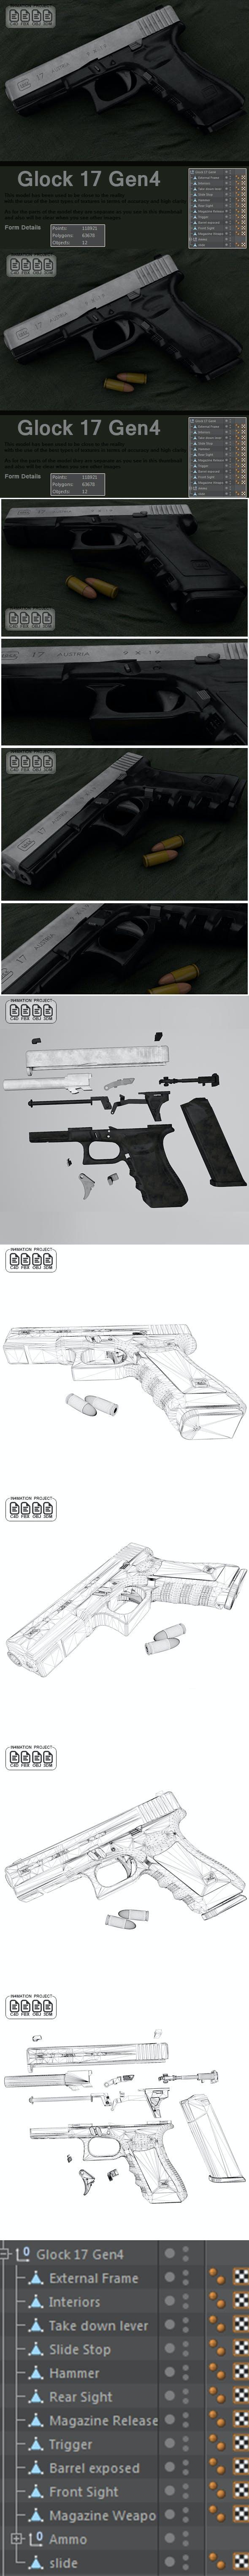 Glock 17 Gen 4 [ 3D MODEL ] Real by LaythJawad | 3DOcean